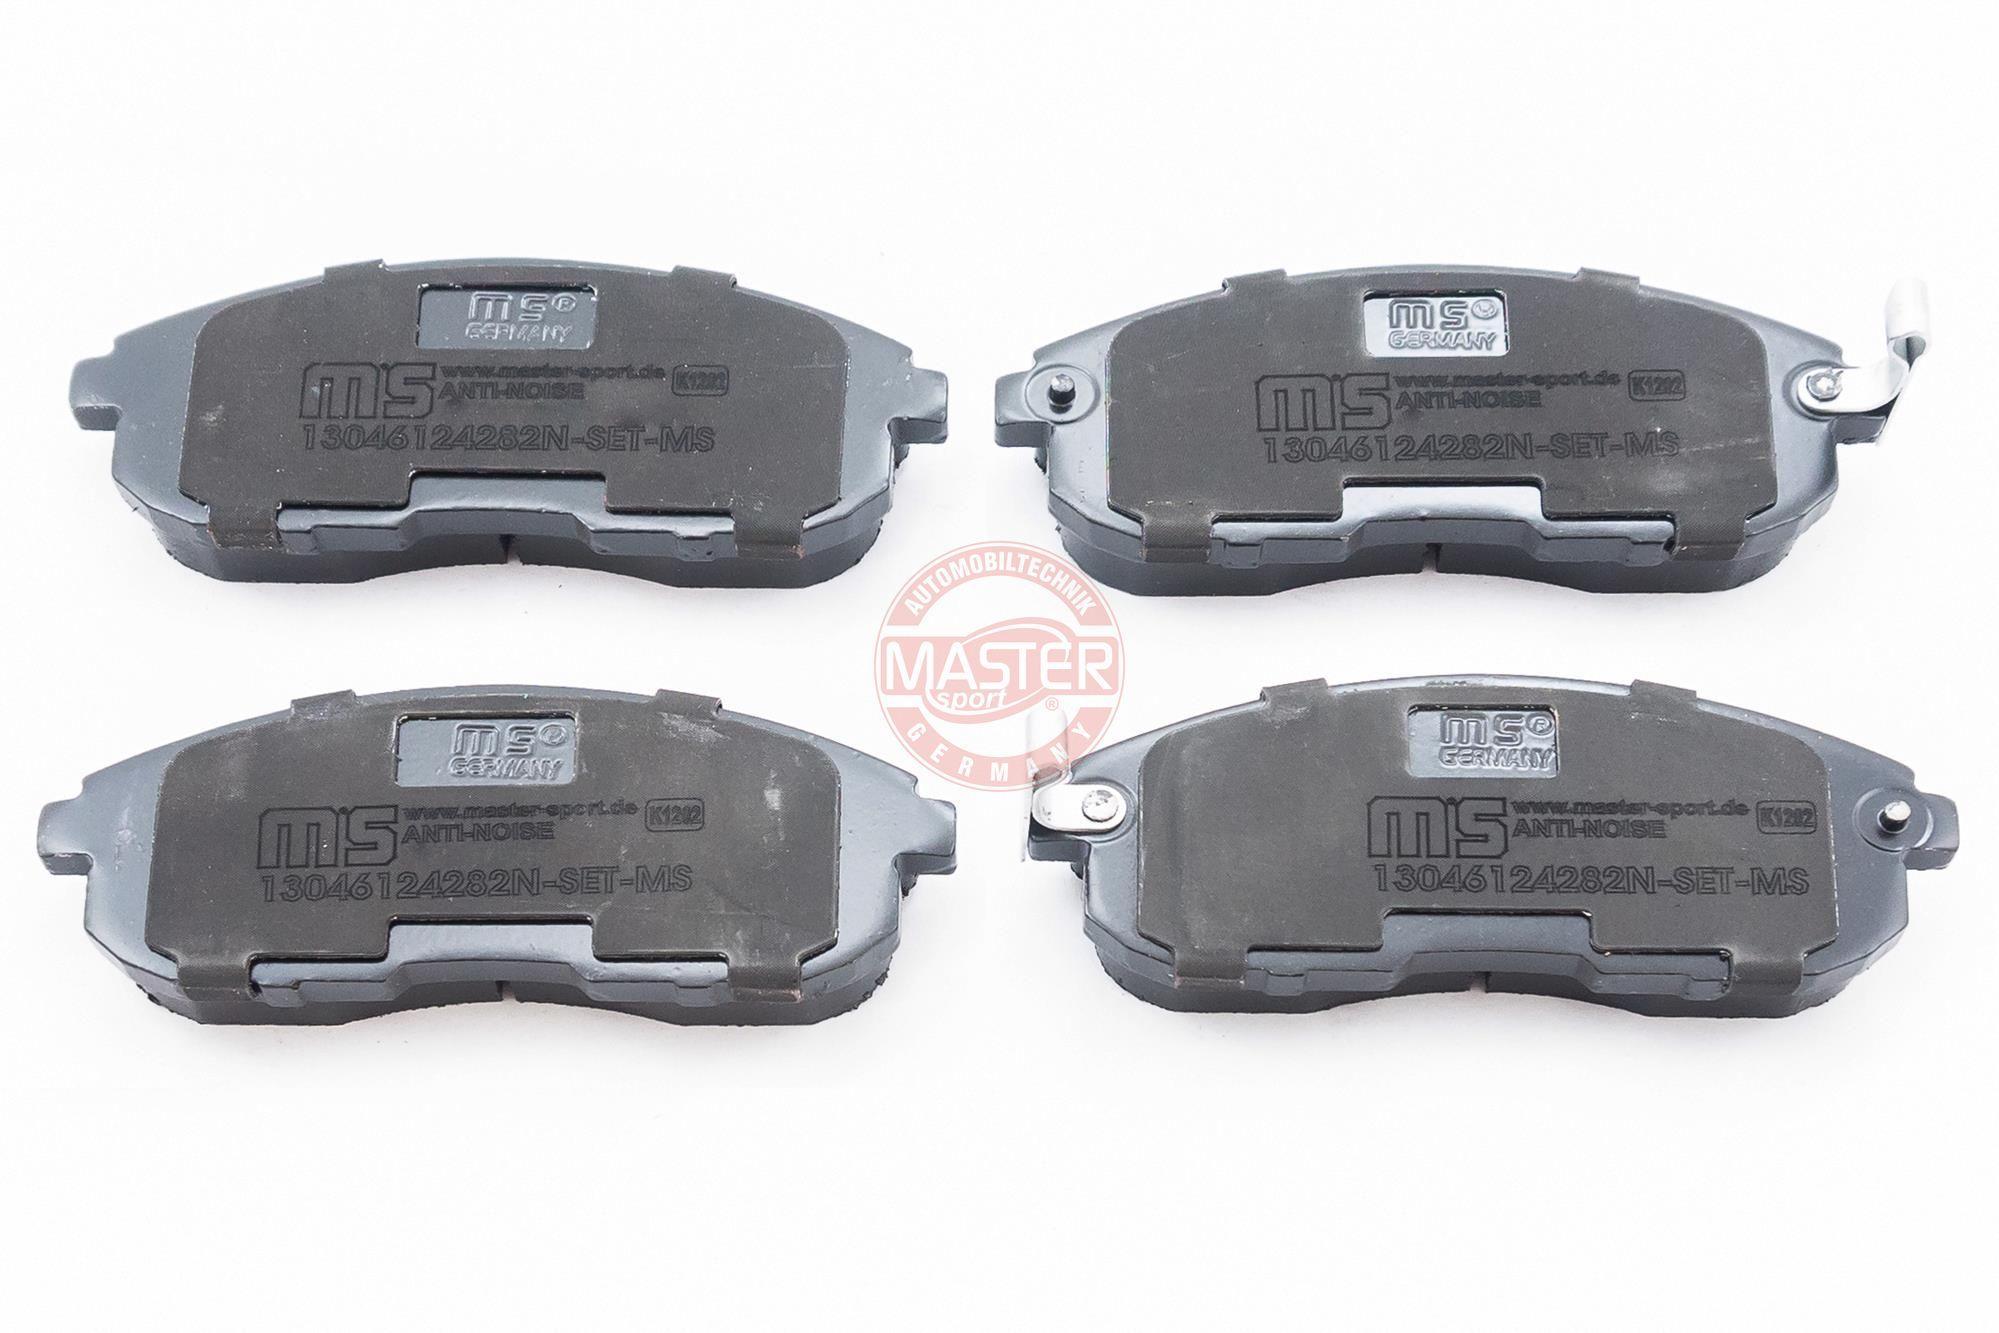 Bremsbeläge 13046124282N-SET-MS MASTER-SPORT 236124282 in Original Qualität